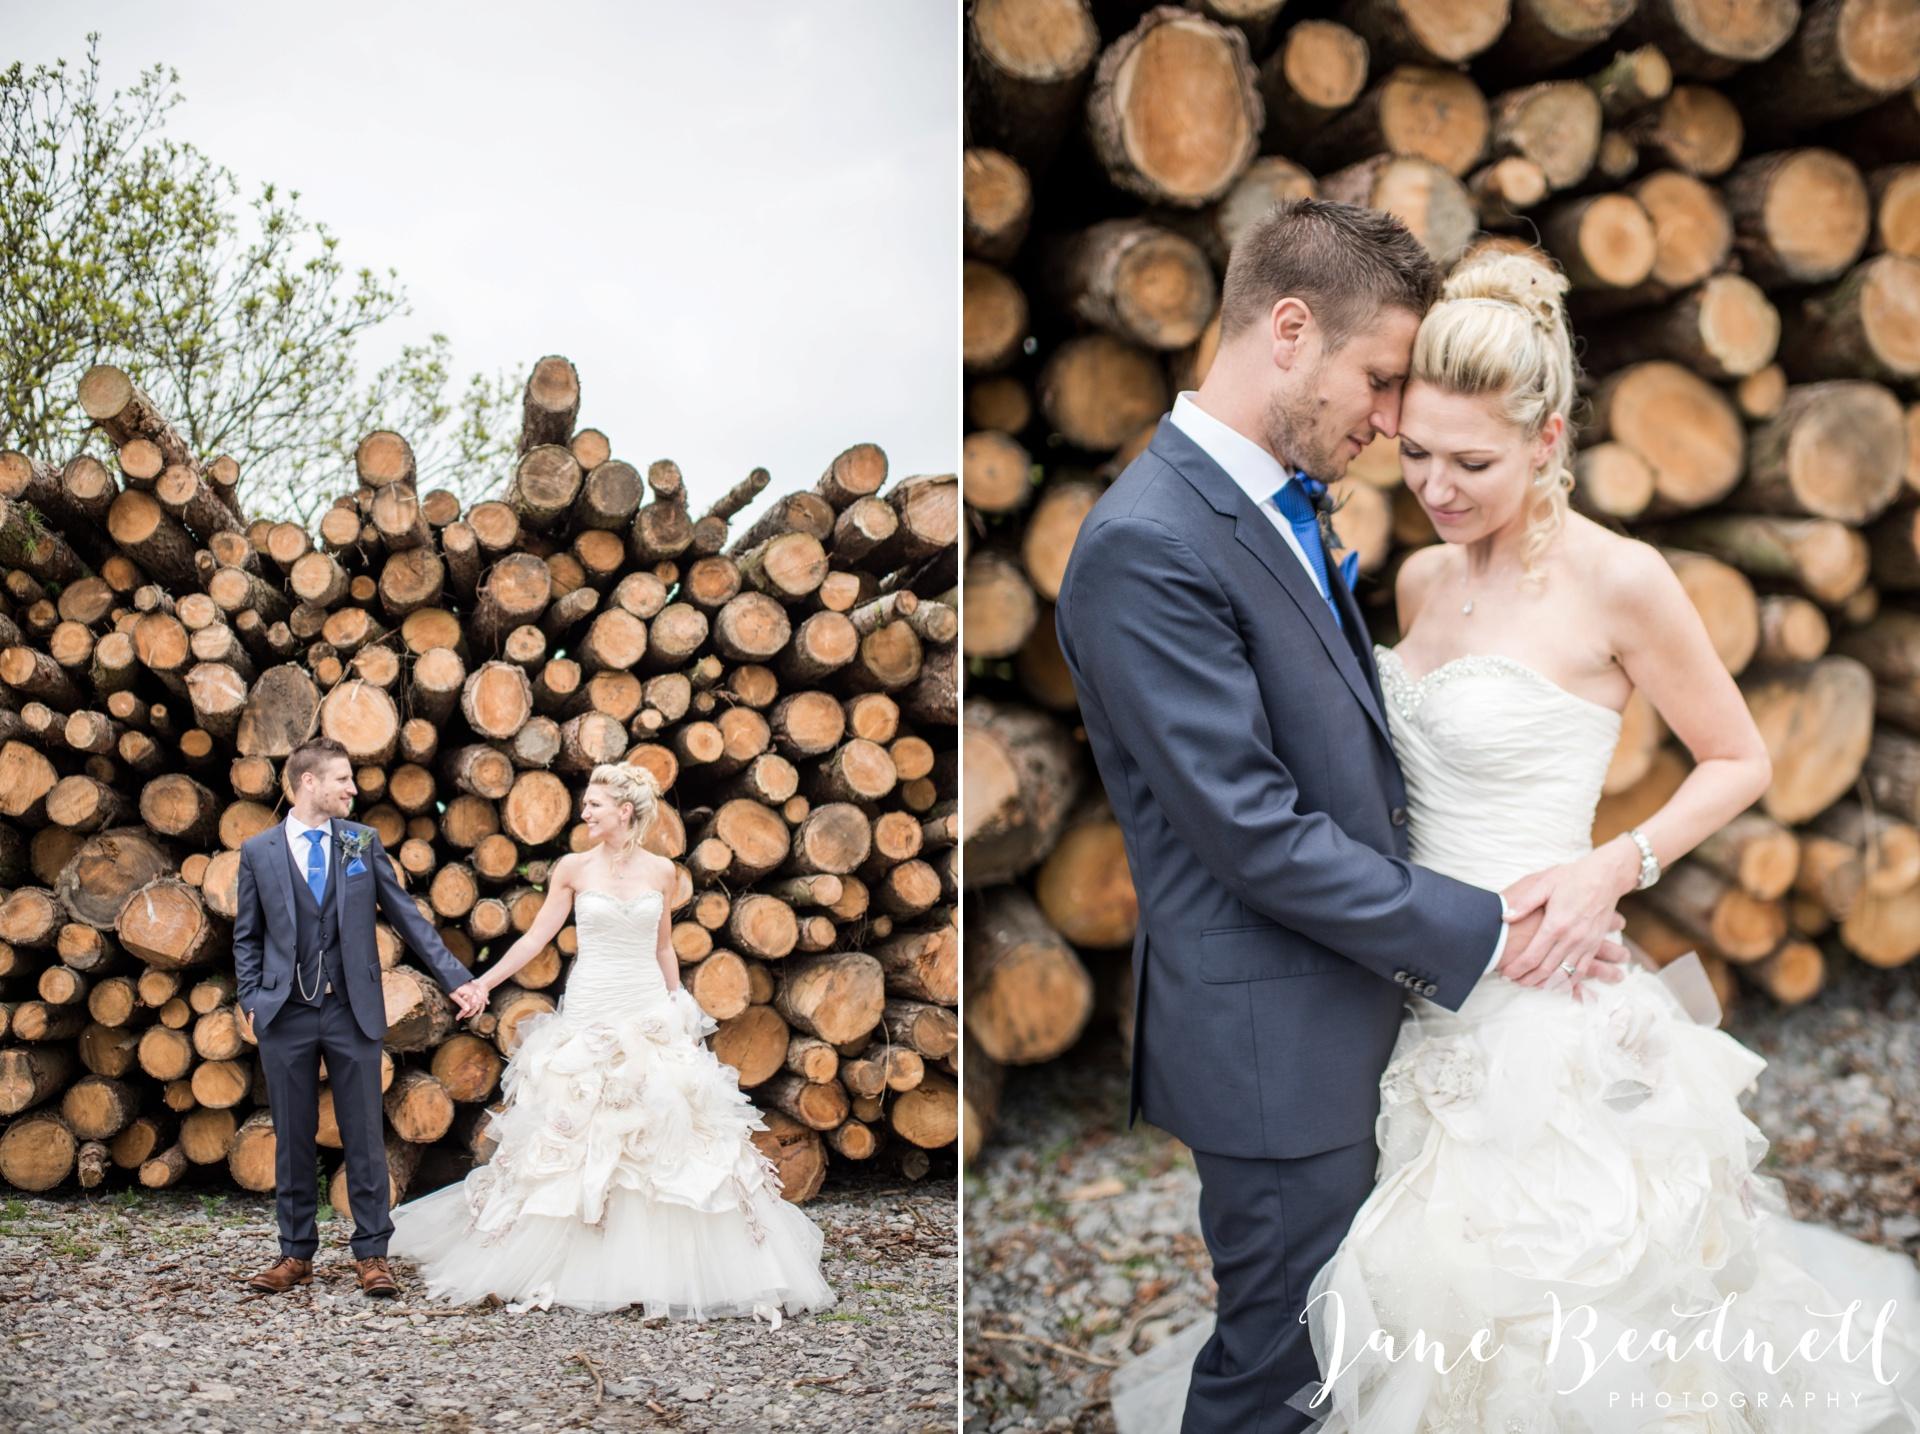 Hill Top Farm Wedding Photography Masham by Jane Beadnell Photography_0058